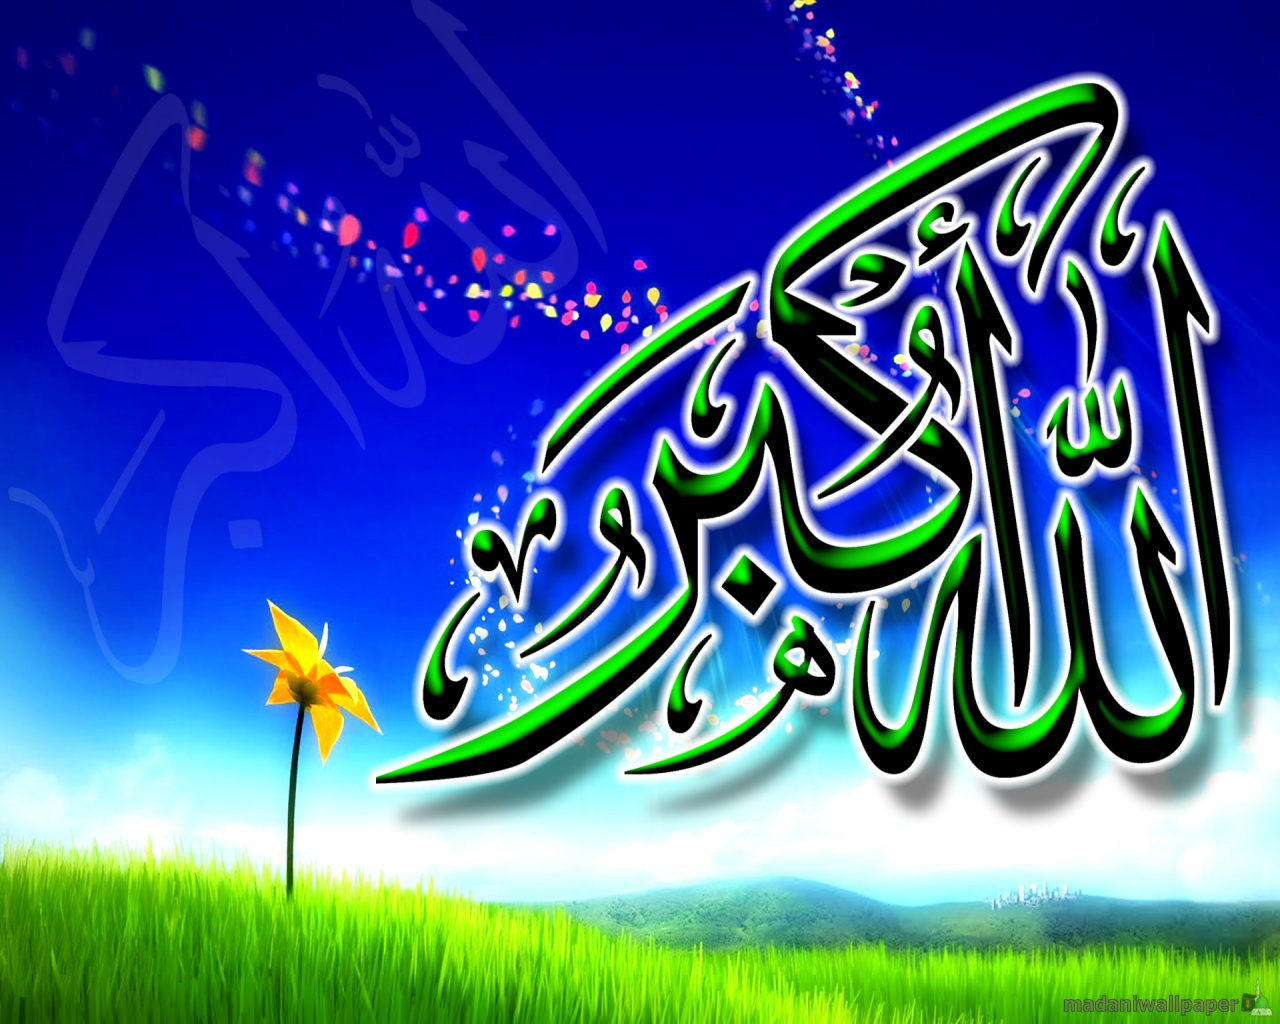 New HD Natural Allah O Akbar Wallpaper 2012 1280x1024